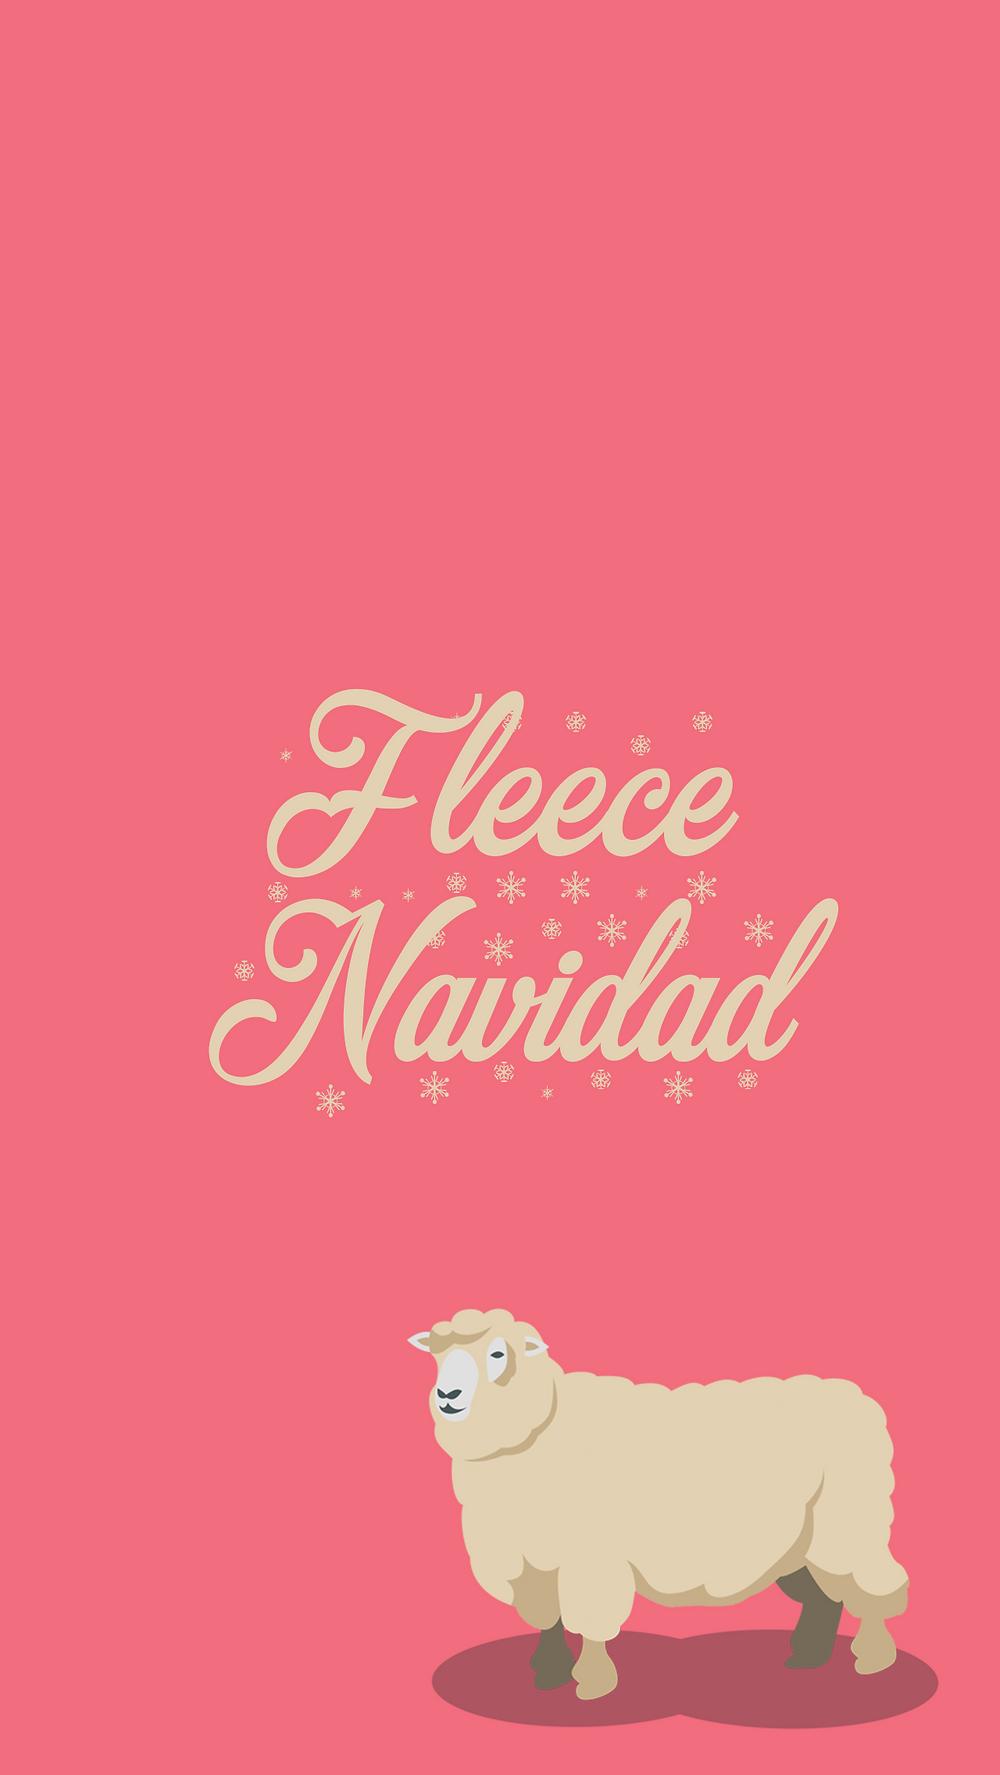 Holiday Phone Wallpapers - Christmas Backgrounds -- Christmas Phone backgrounds - winter phone backgrounds - cassandra ann - Fleece Navidad background